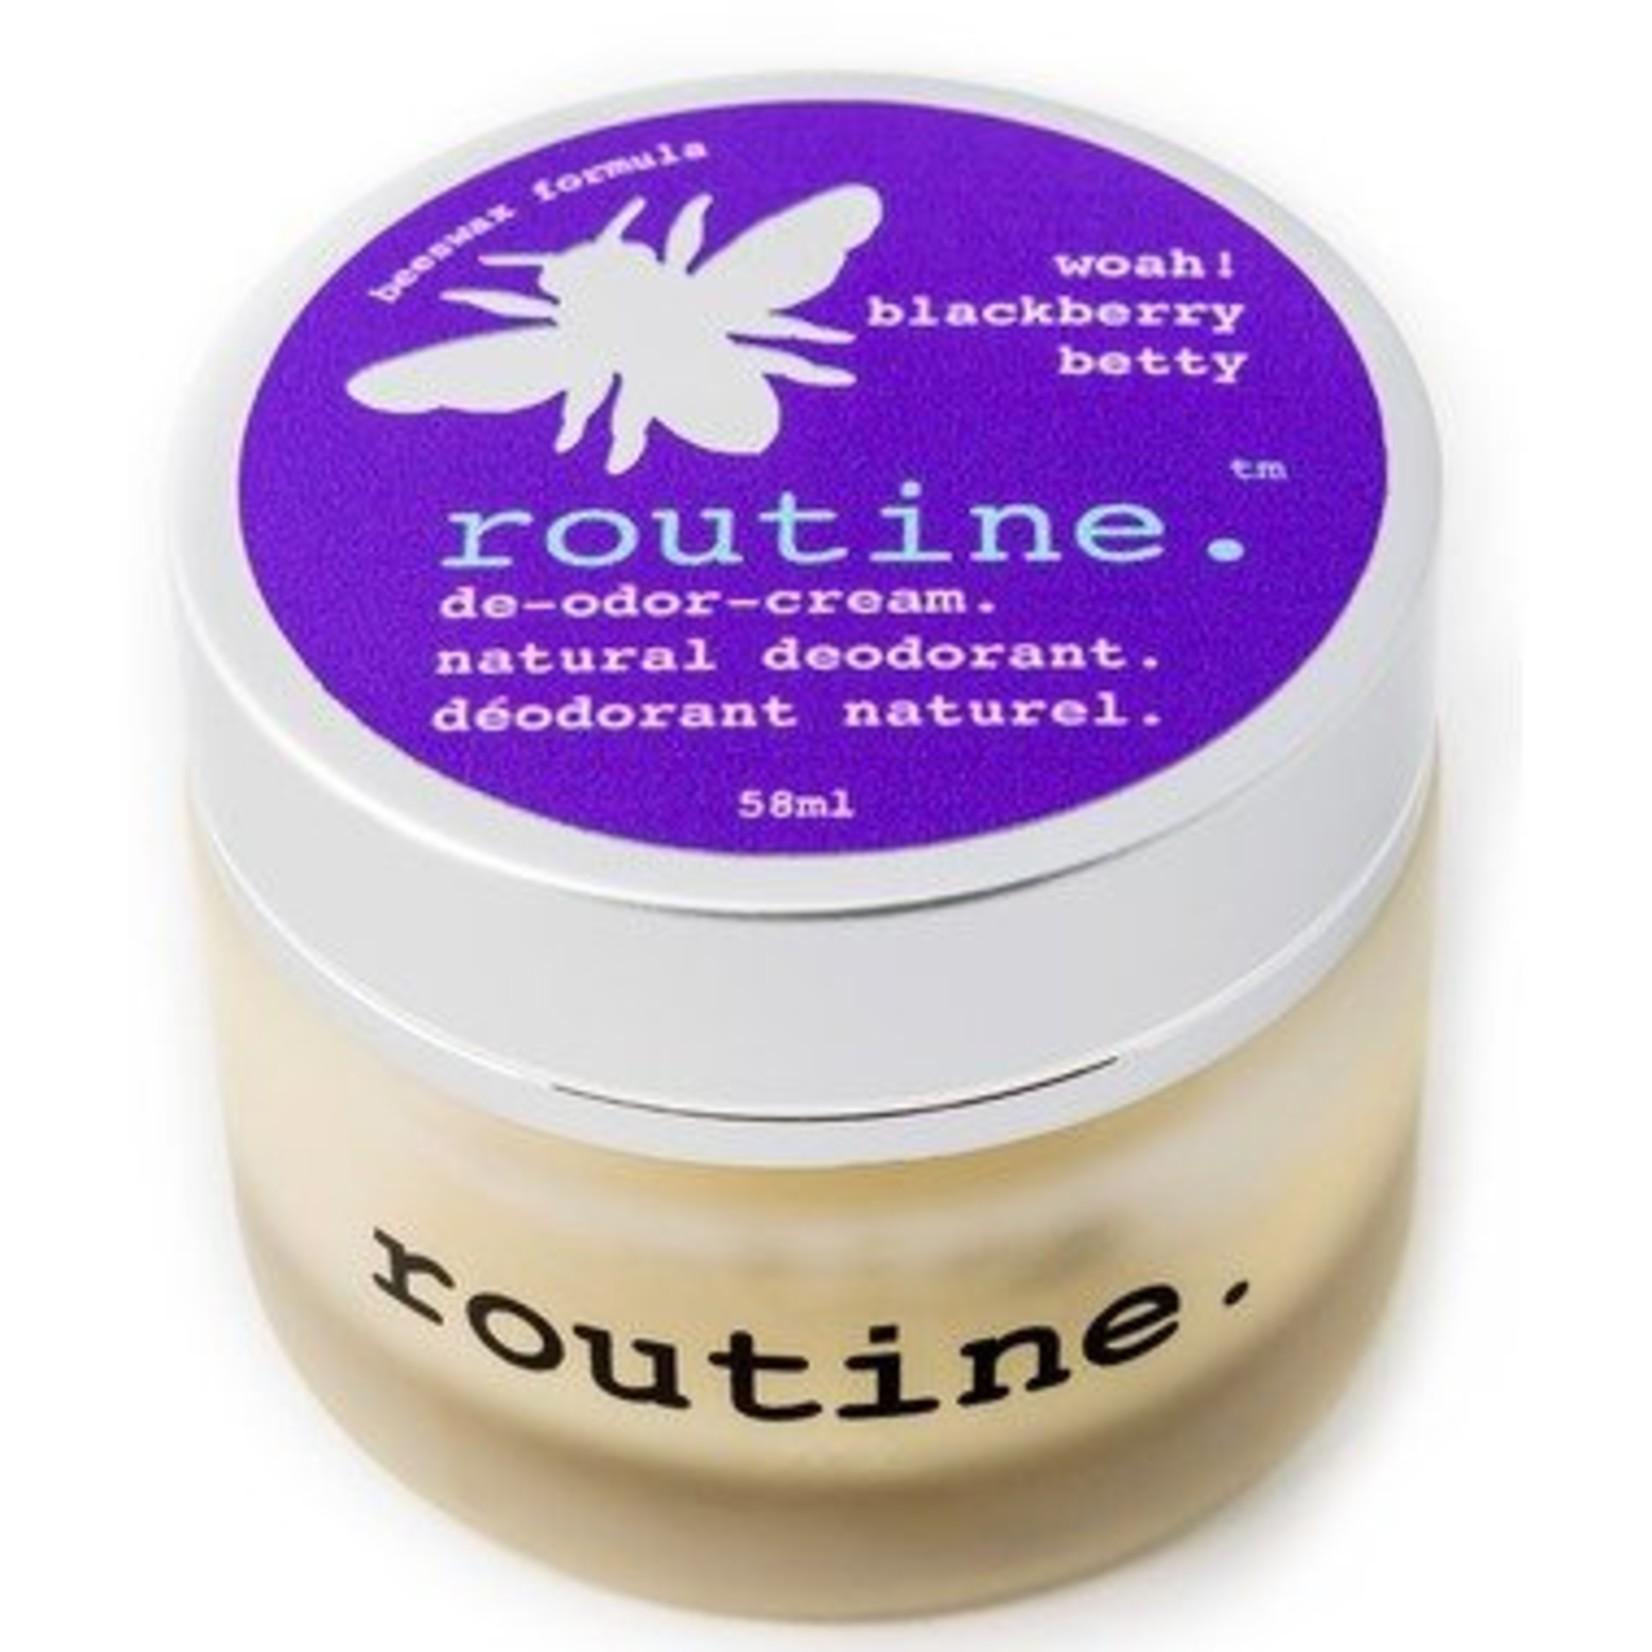 Routine Natural Deodorant Blackberry Betty